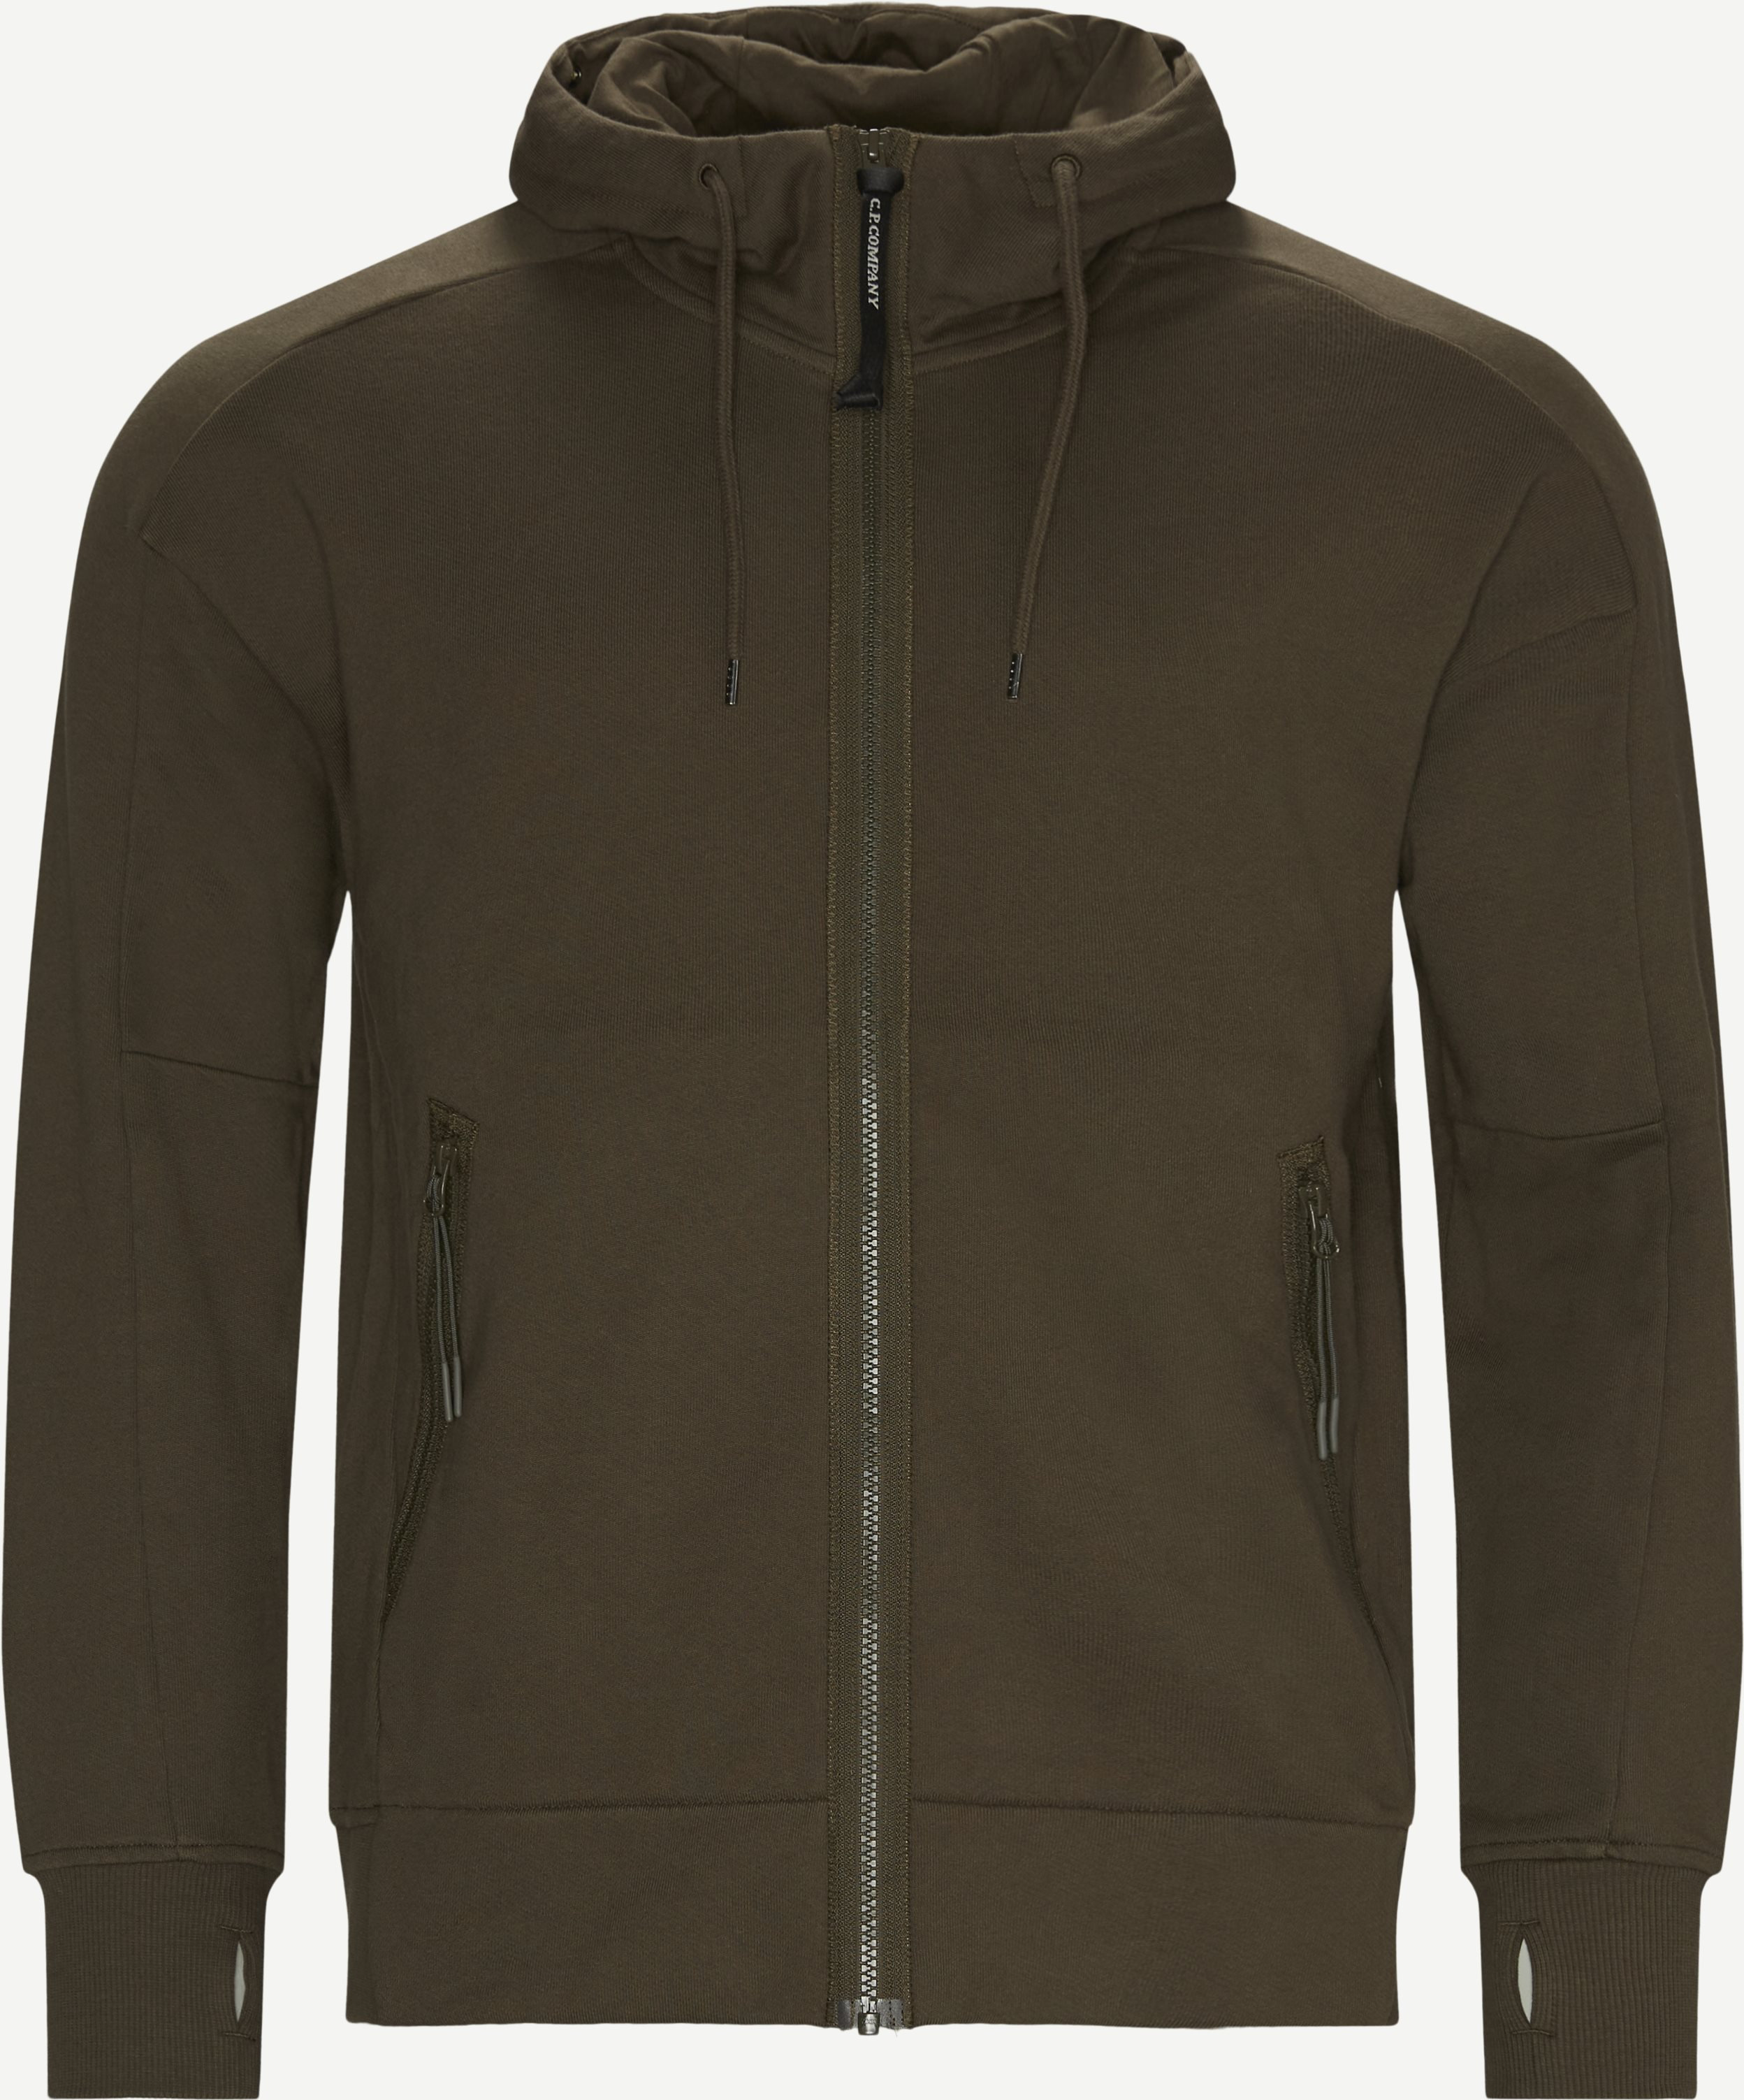 Sweatshirts - Regular - Army